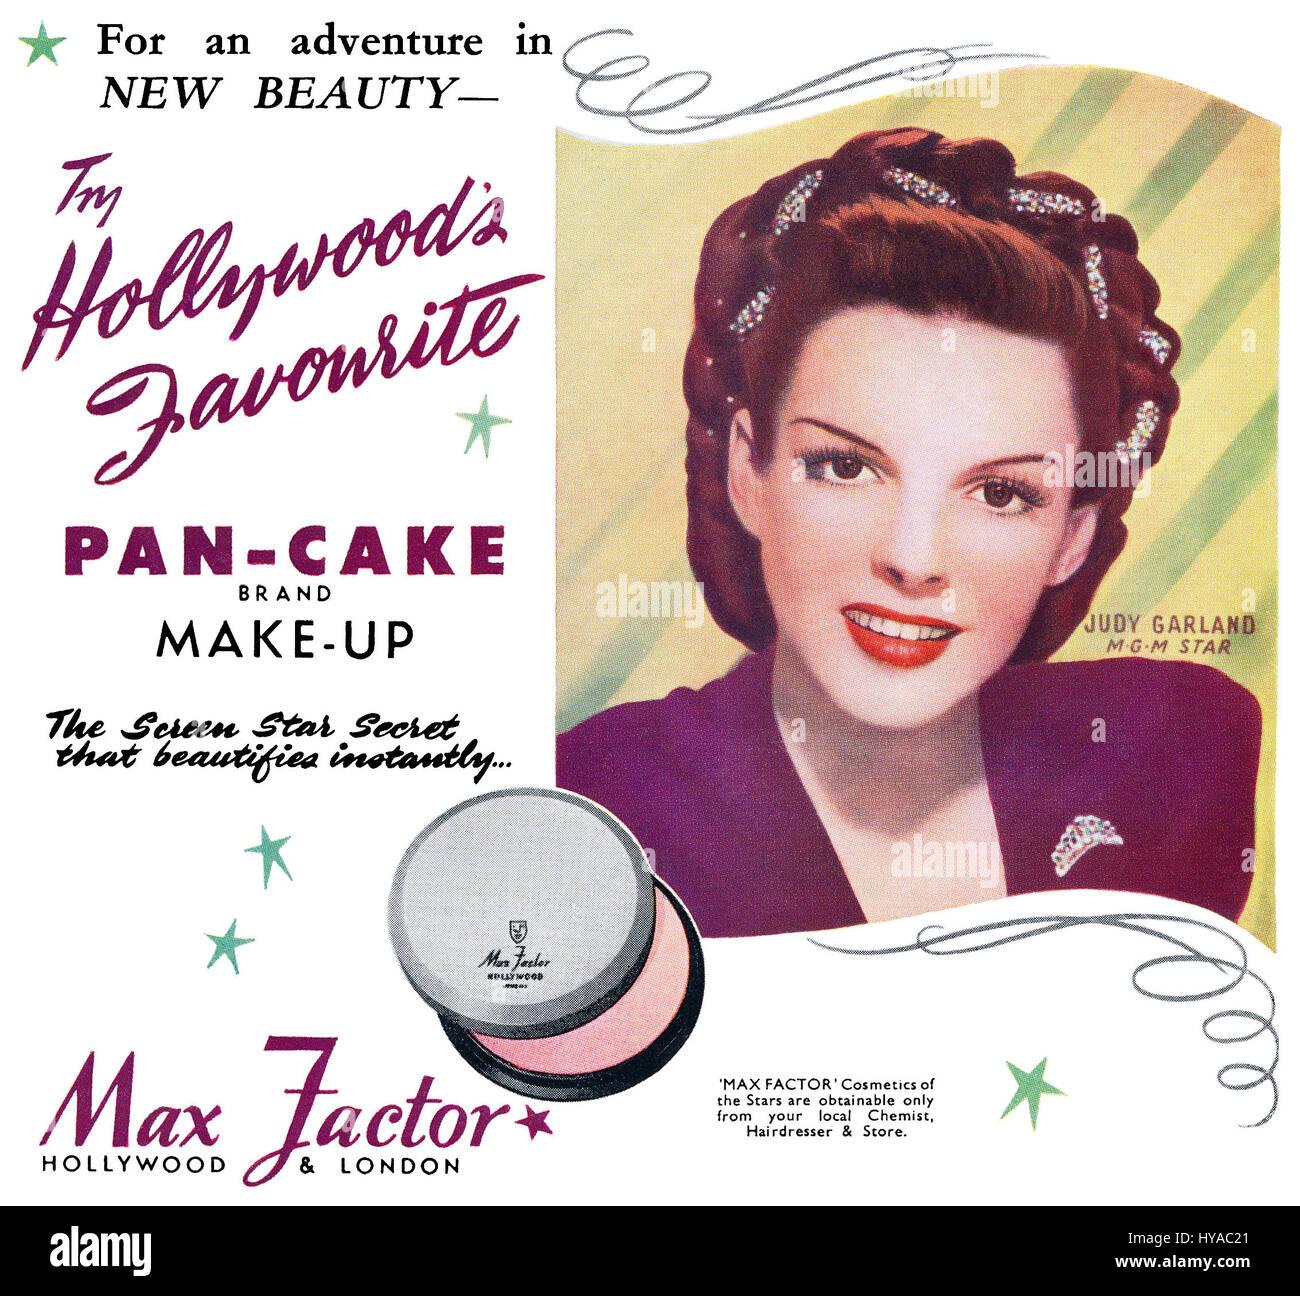 1946 British advertisement for Max Factor Pan-Cake Make-Up, featuring Hollywood actress Judy Garland. - Stock Image